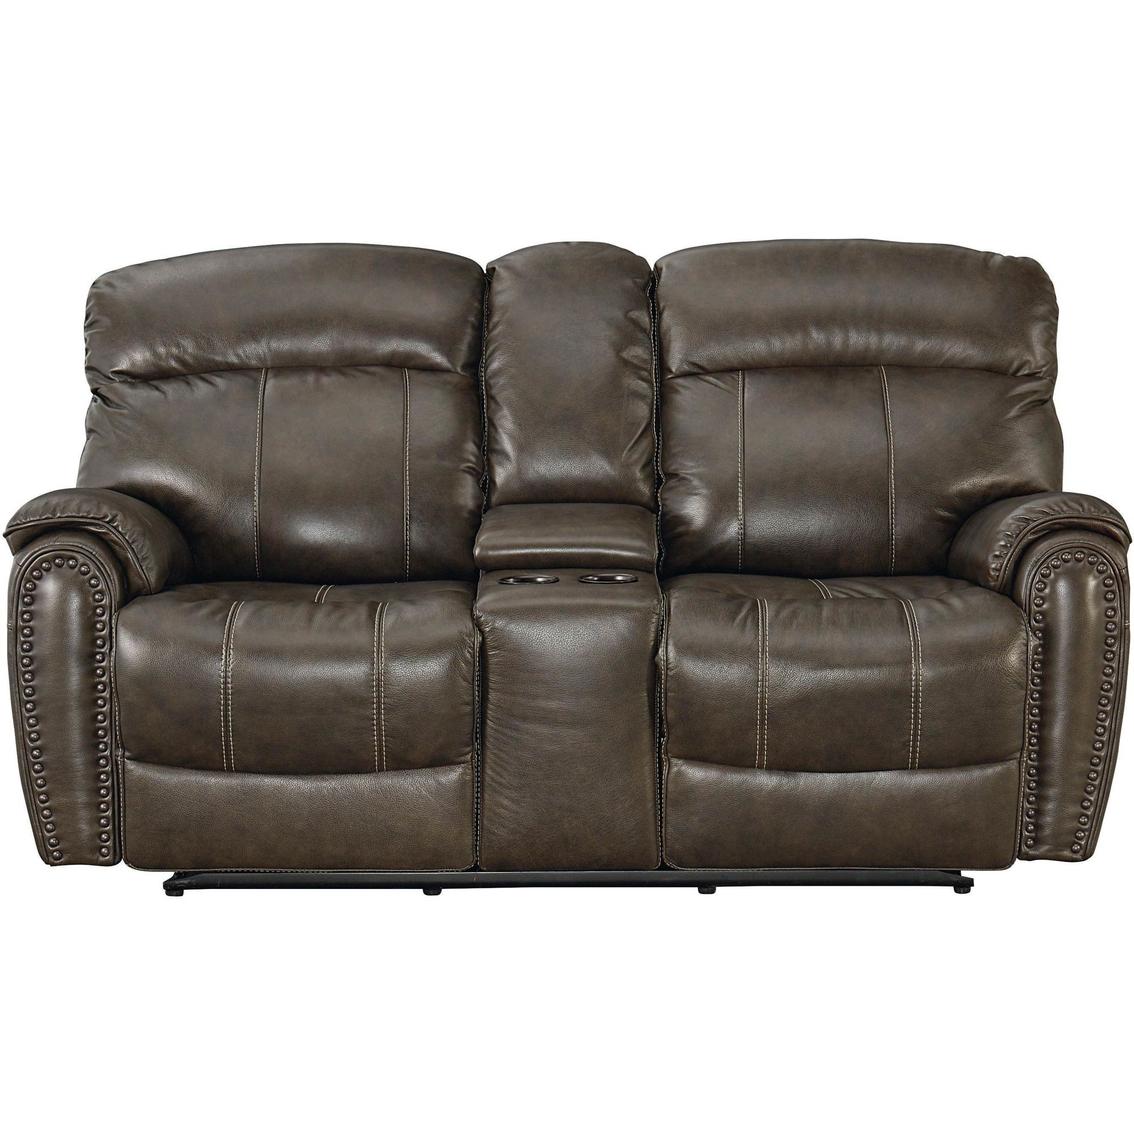 Bassett Club Level Bridgeport Power Reclining Loveseat Sofas Couches Furniture Appliances Shop The Exchange